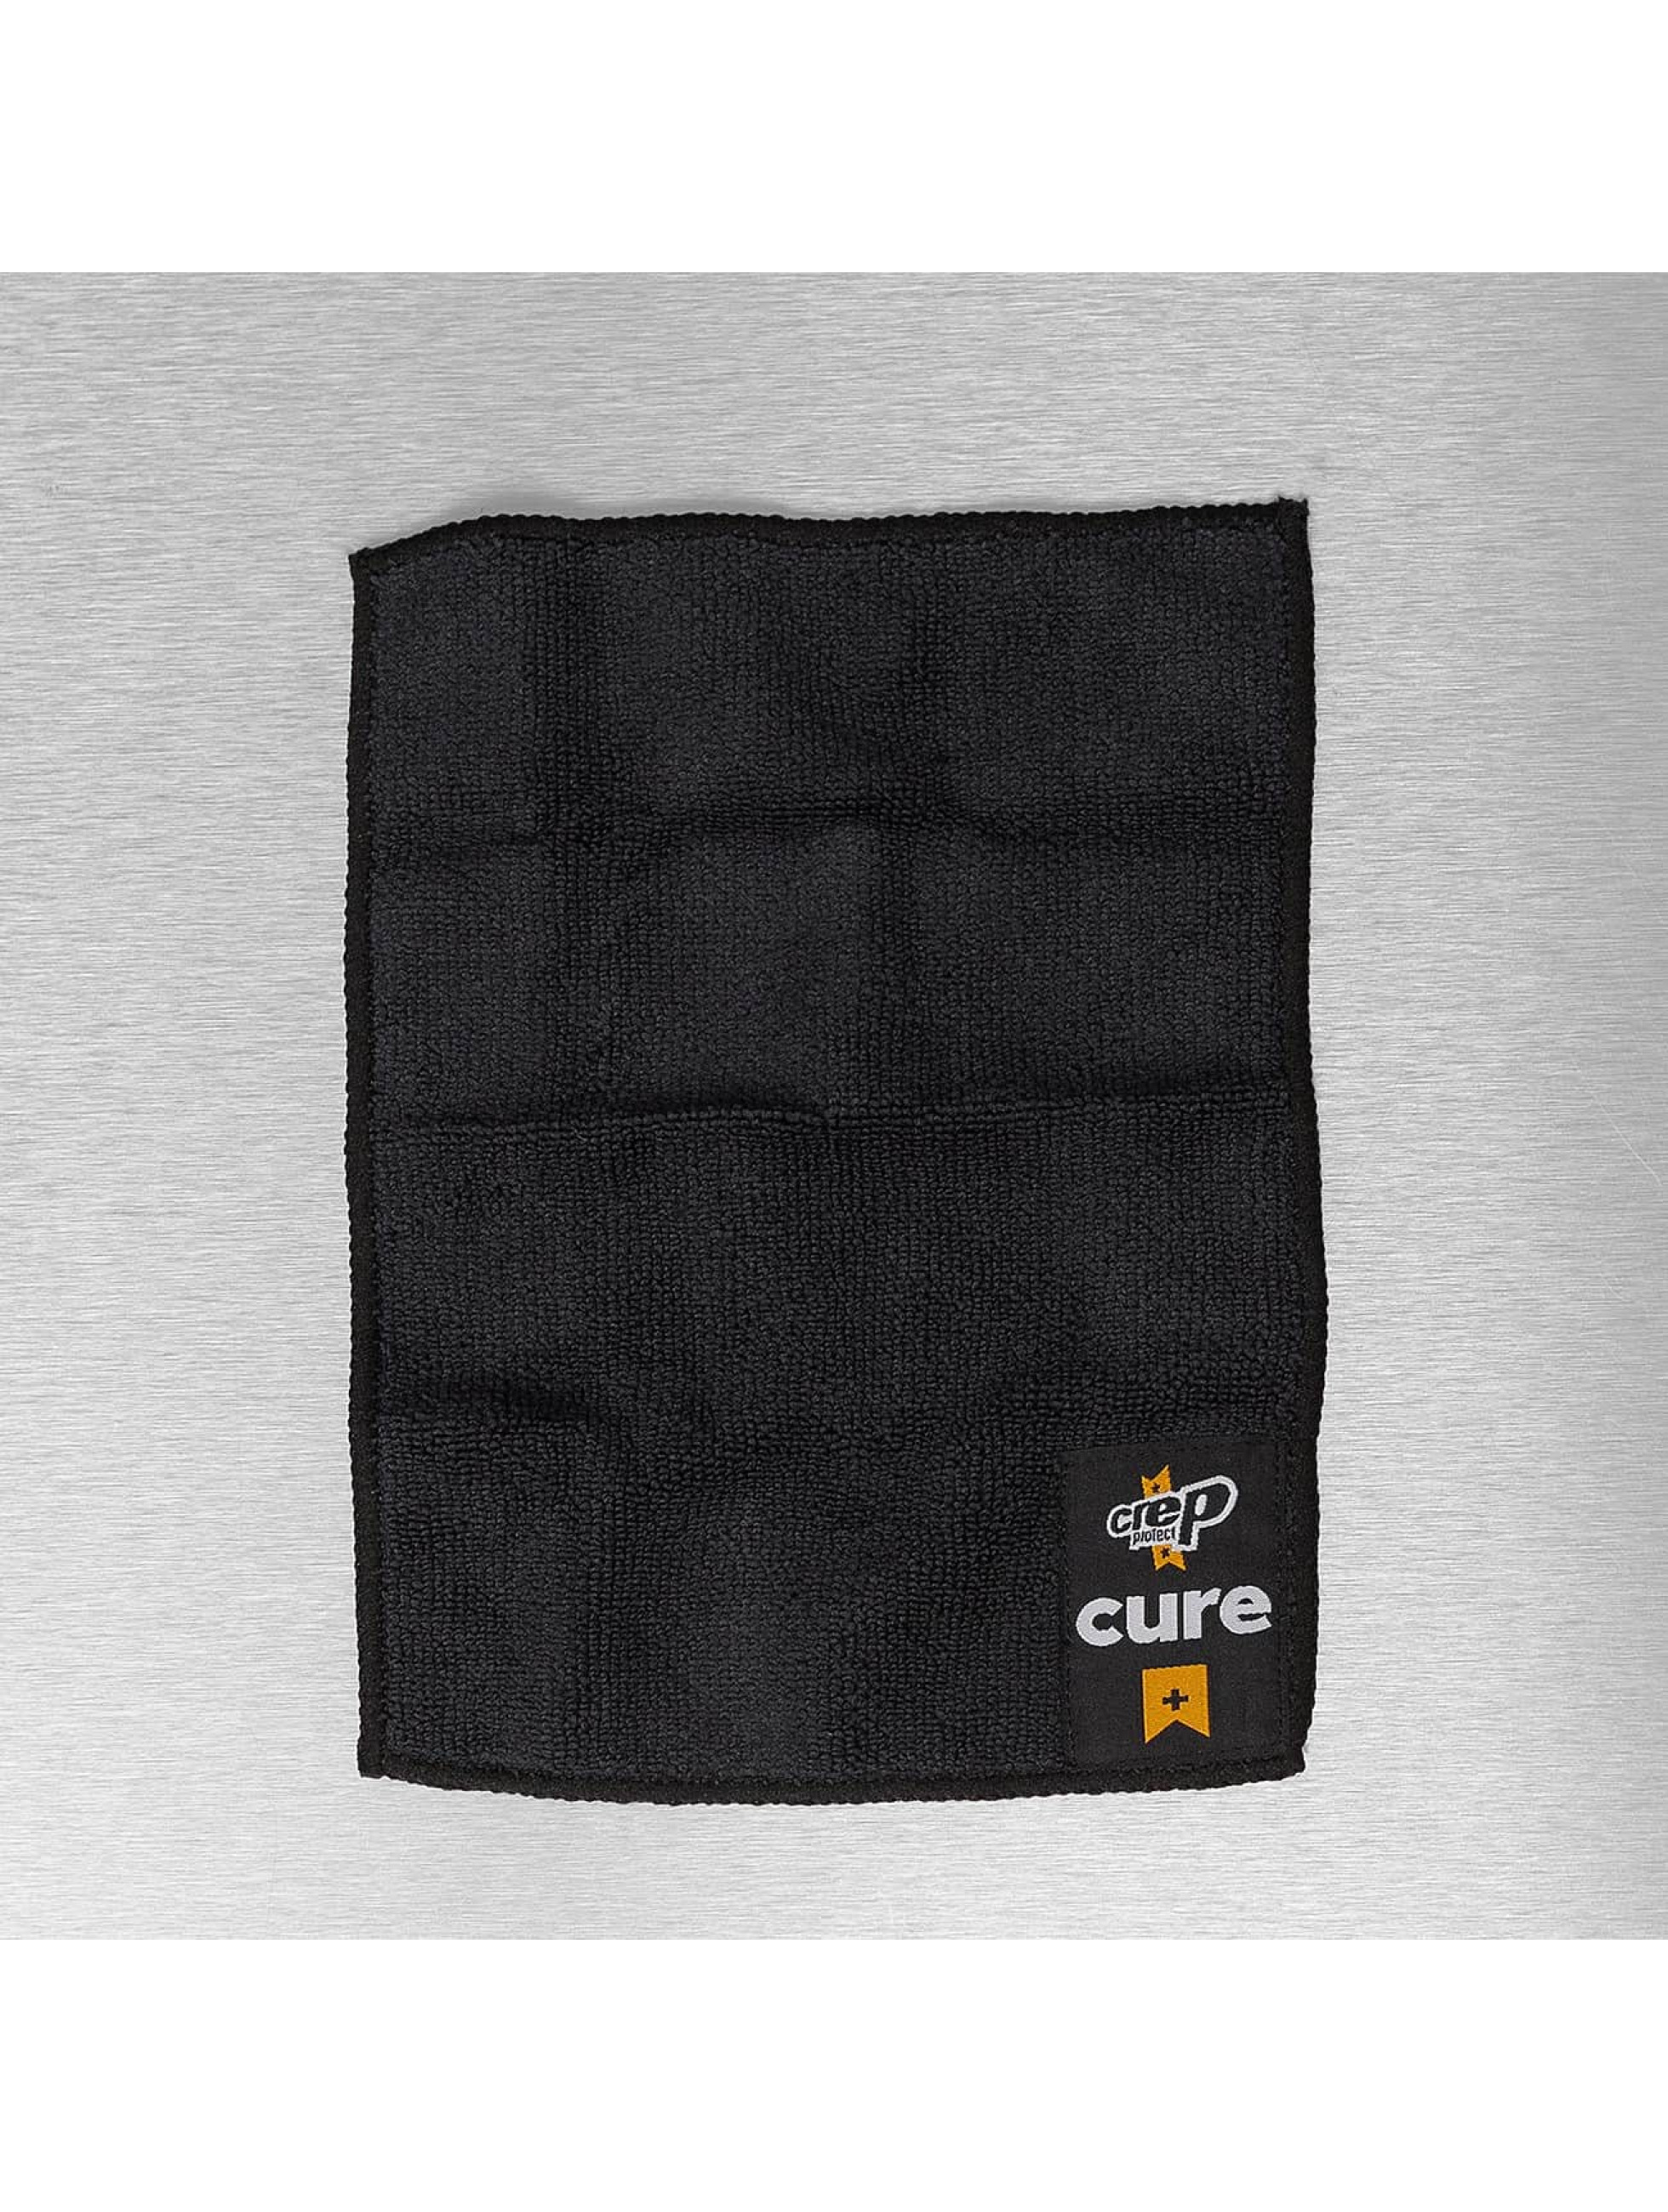 crep protect ultimate gift noir l 39 entretien et nettoyage crep protect acheter pas cher. Black Bedroom Furniture Sets. Home Design Ideas